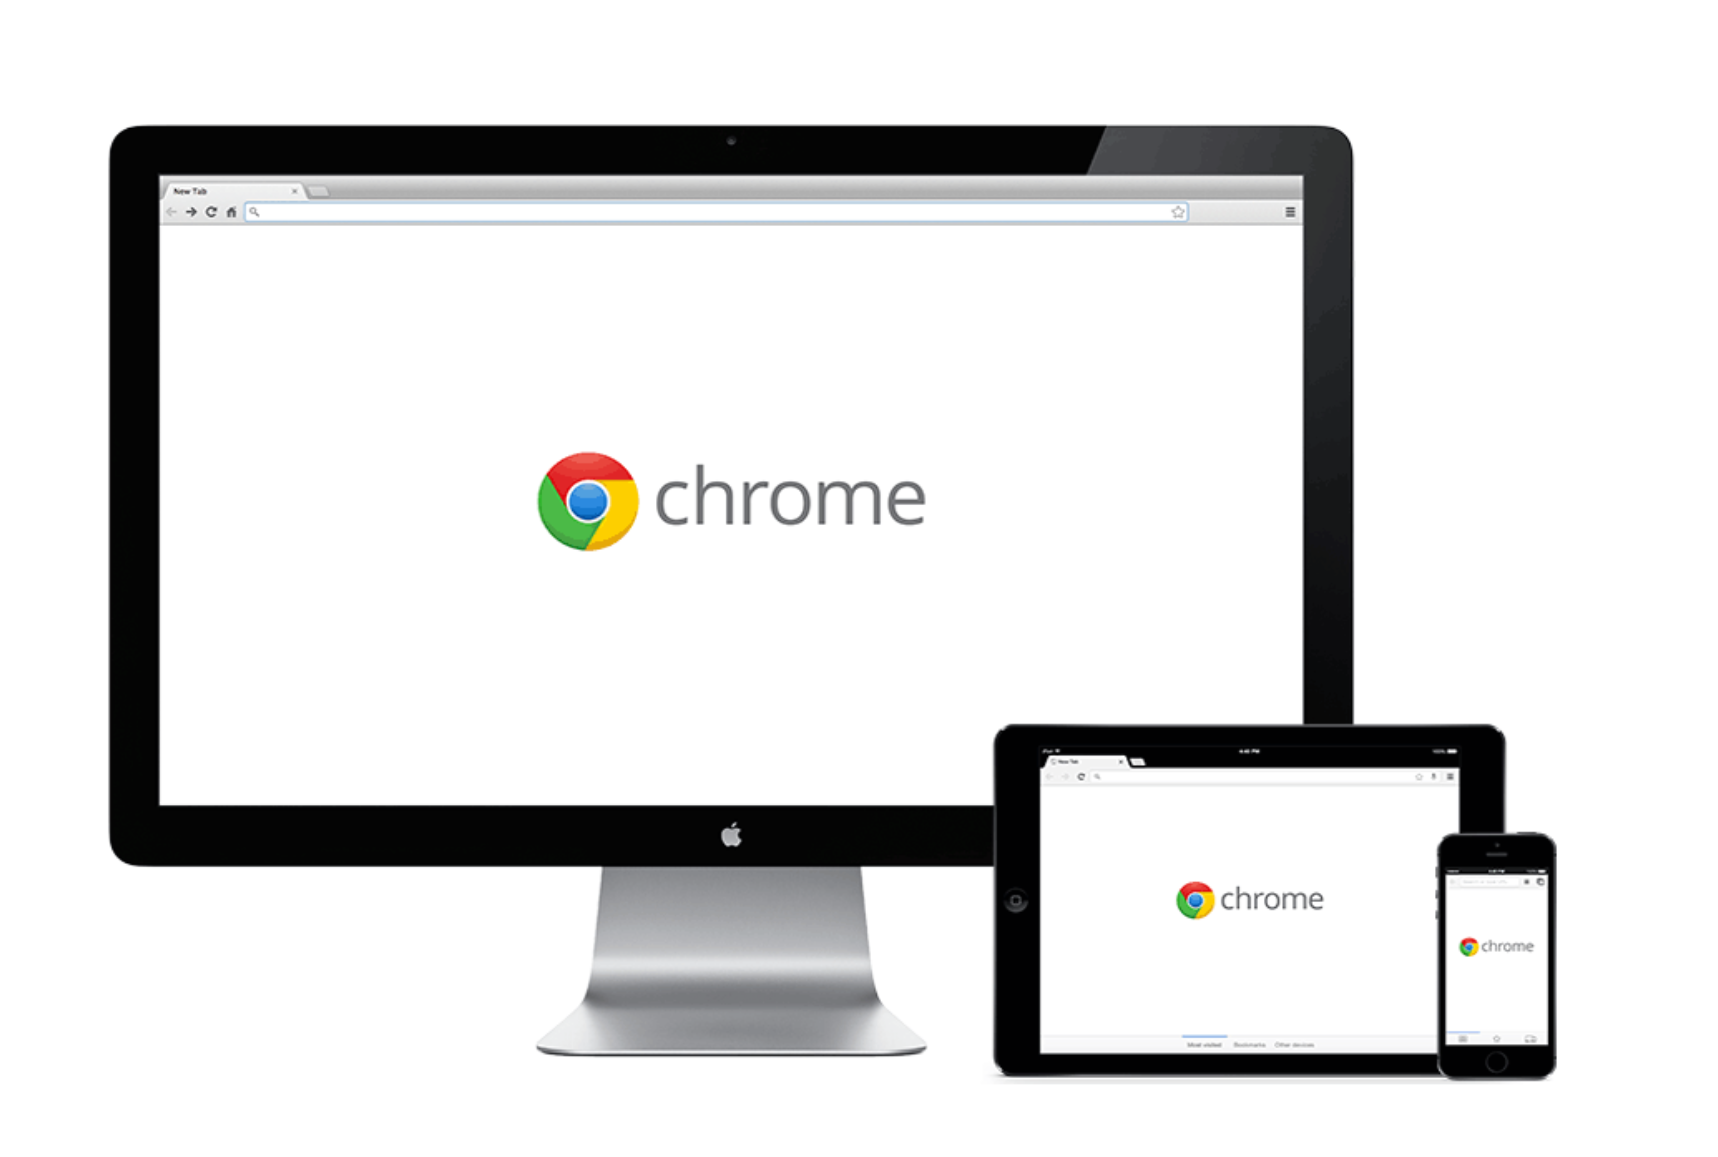 SafariからGoogle Chromeにブックマークを移行する方法【Mac OS X】